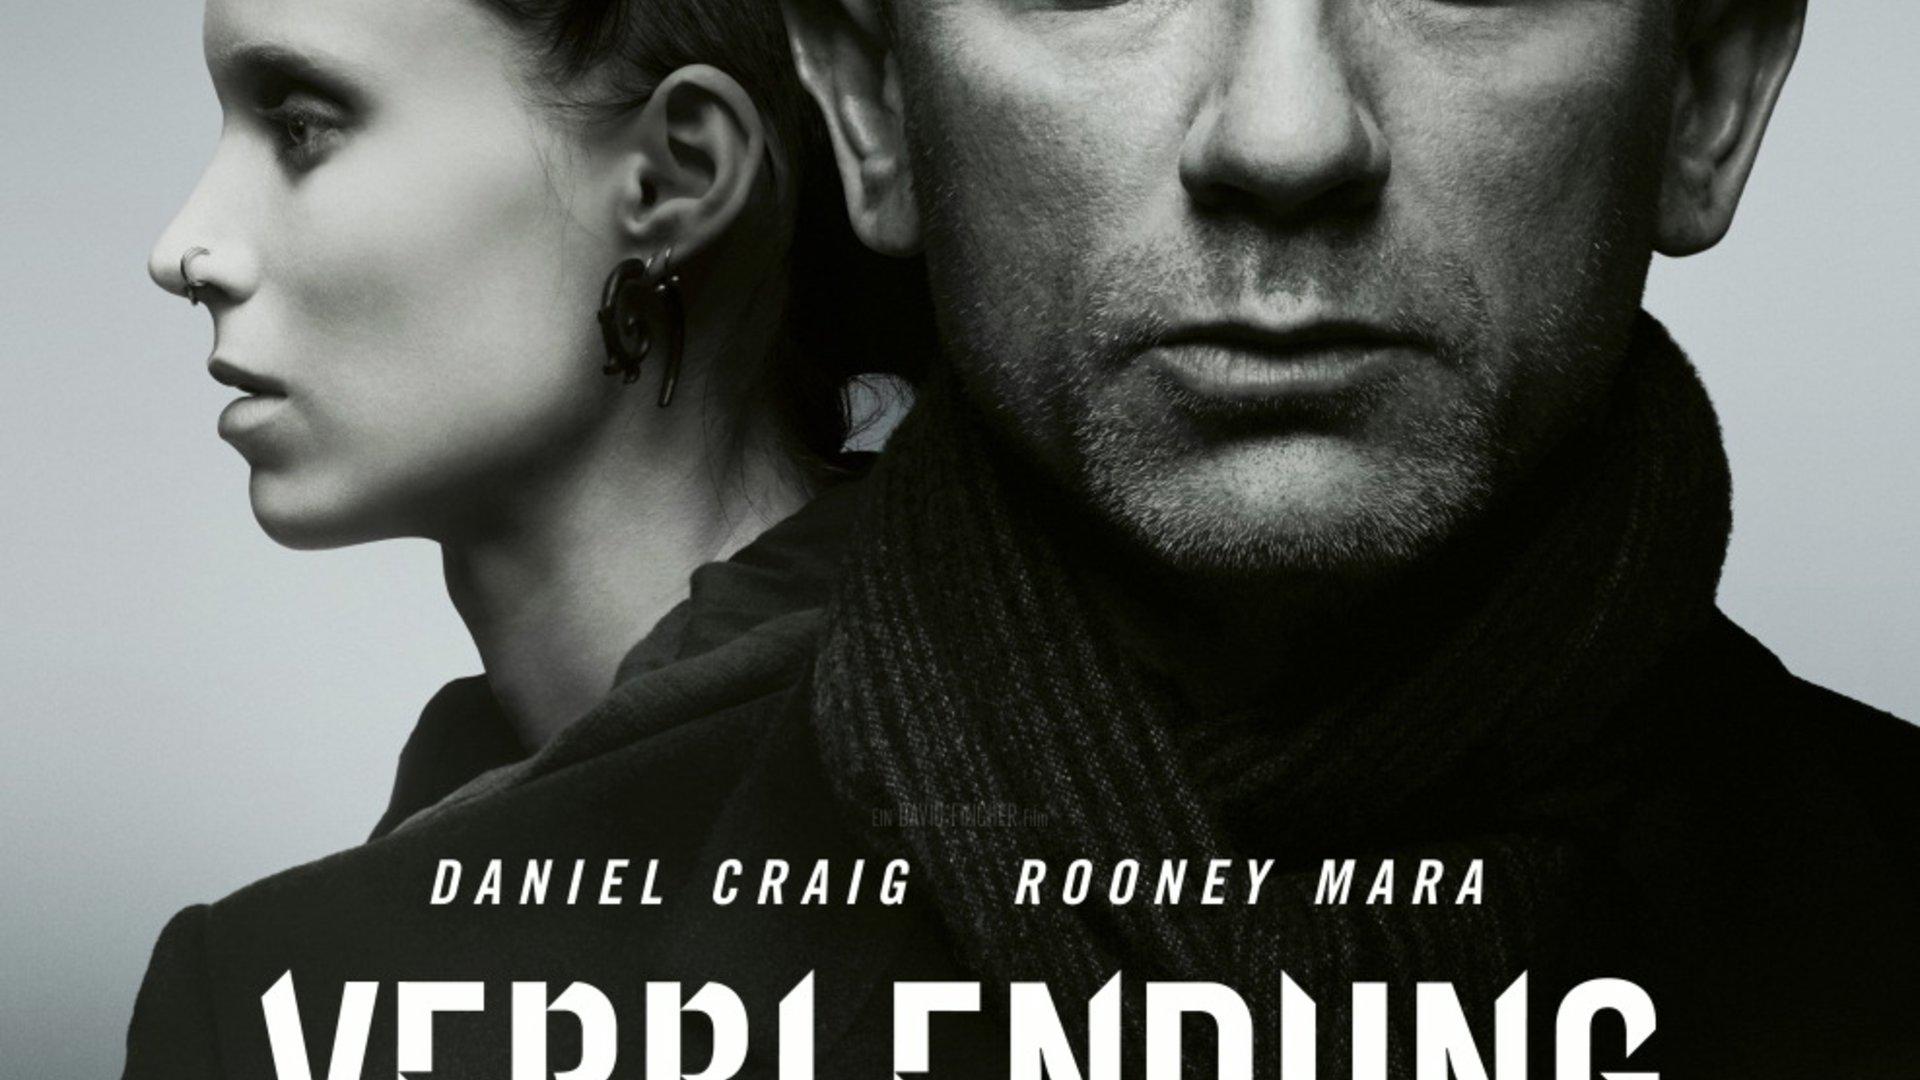 Vergebung craig verdammnis verblendung daniel Daniel Craigs